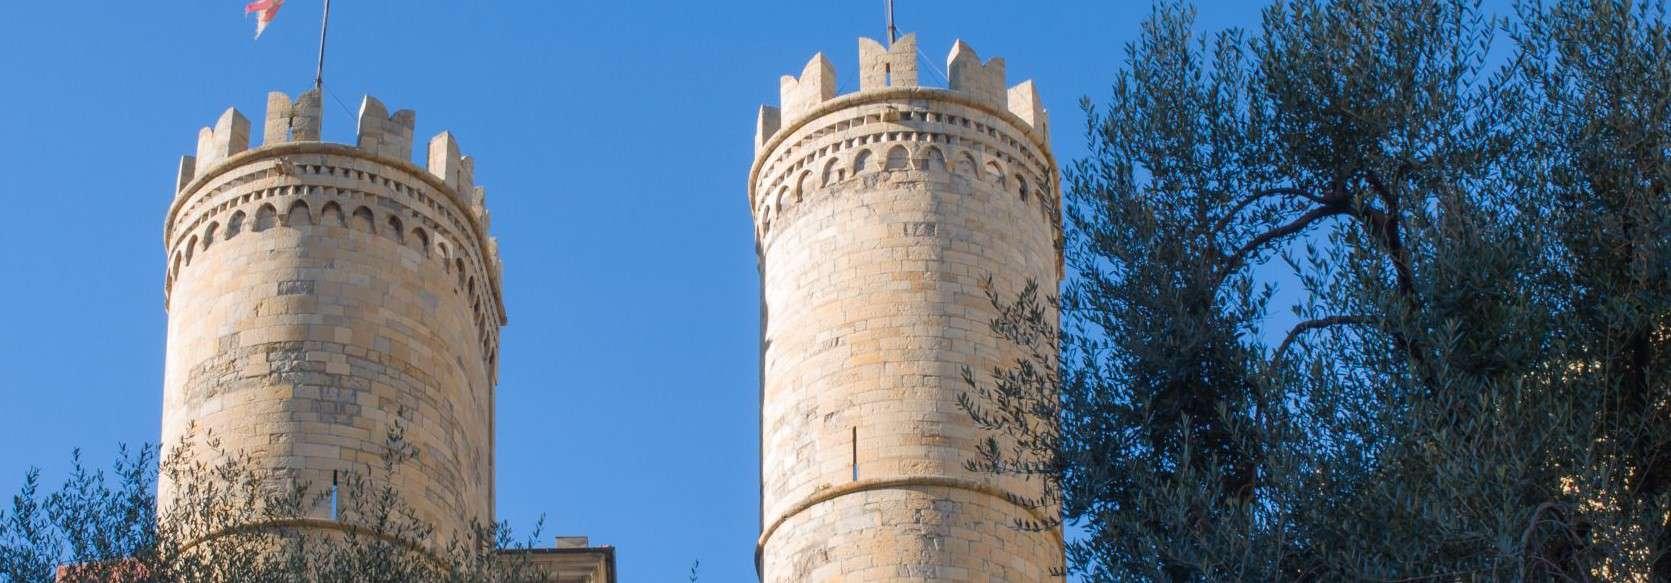 Associazione Culturale Genovese Porta Soprana